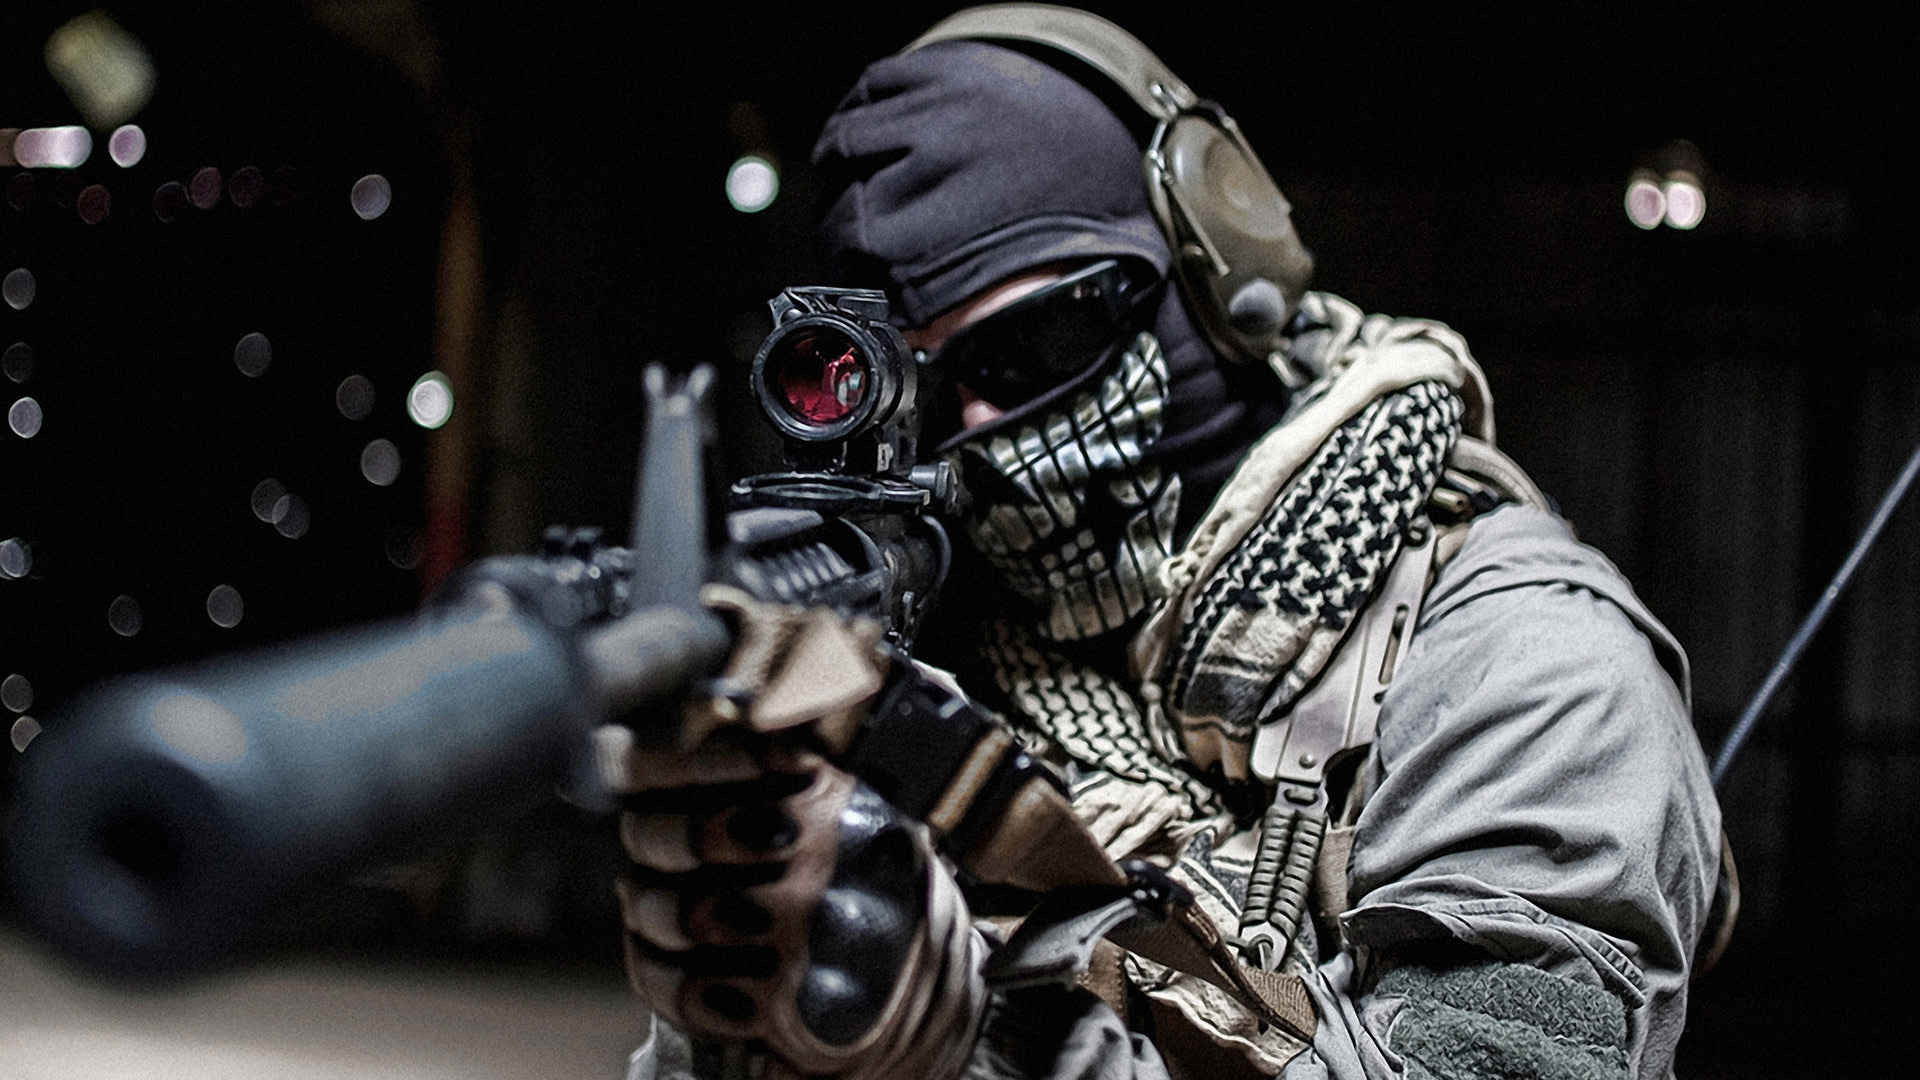 Wallpaper Call Of Duty Advanced Warfare 4k - Game Wallpapers